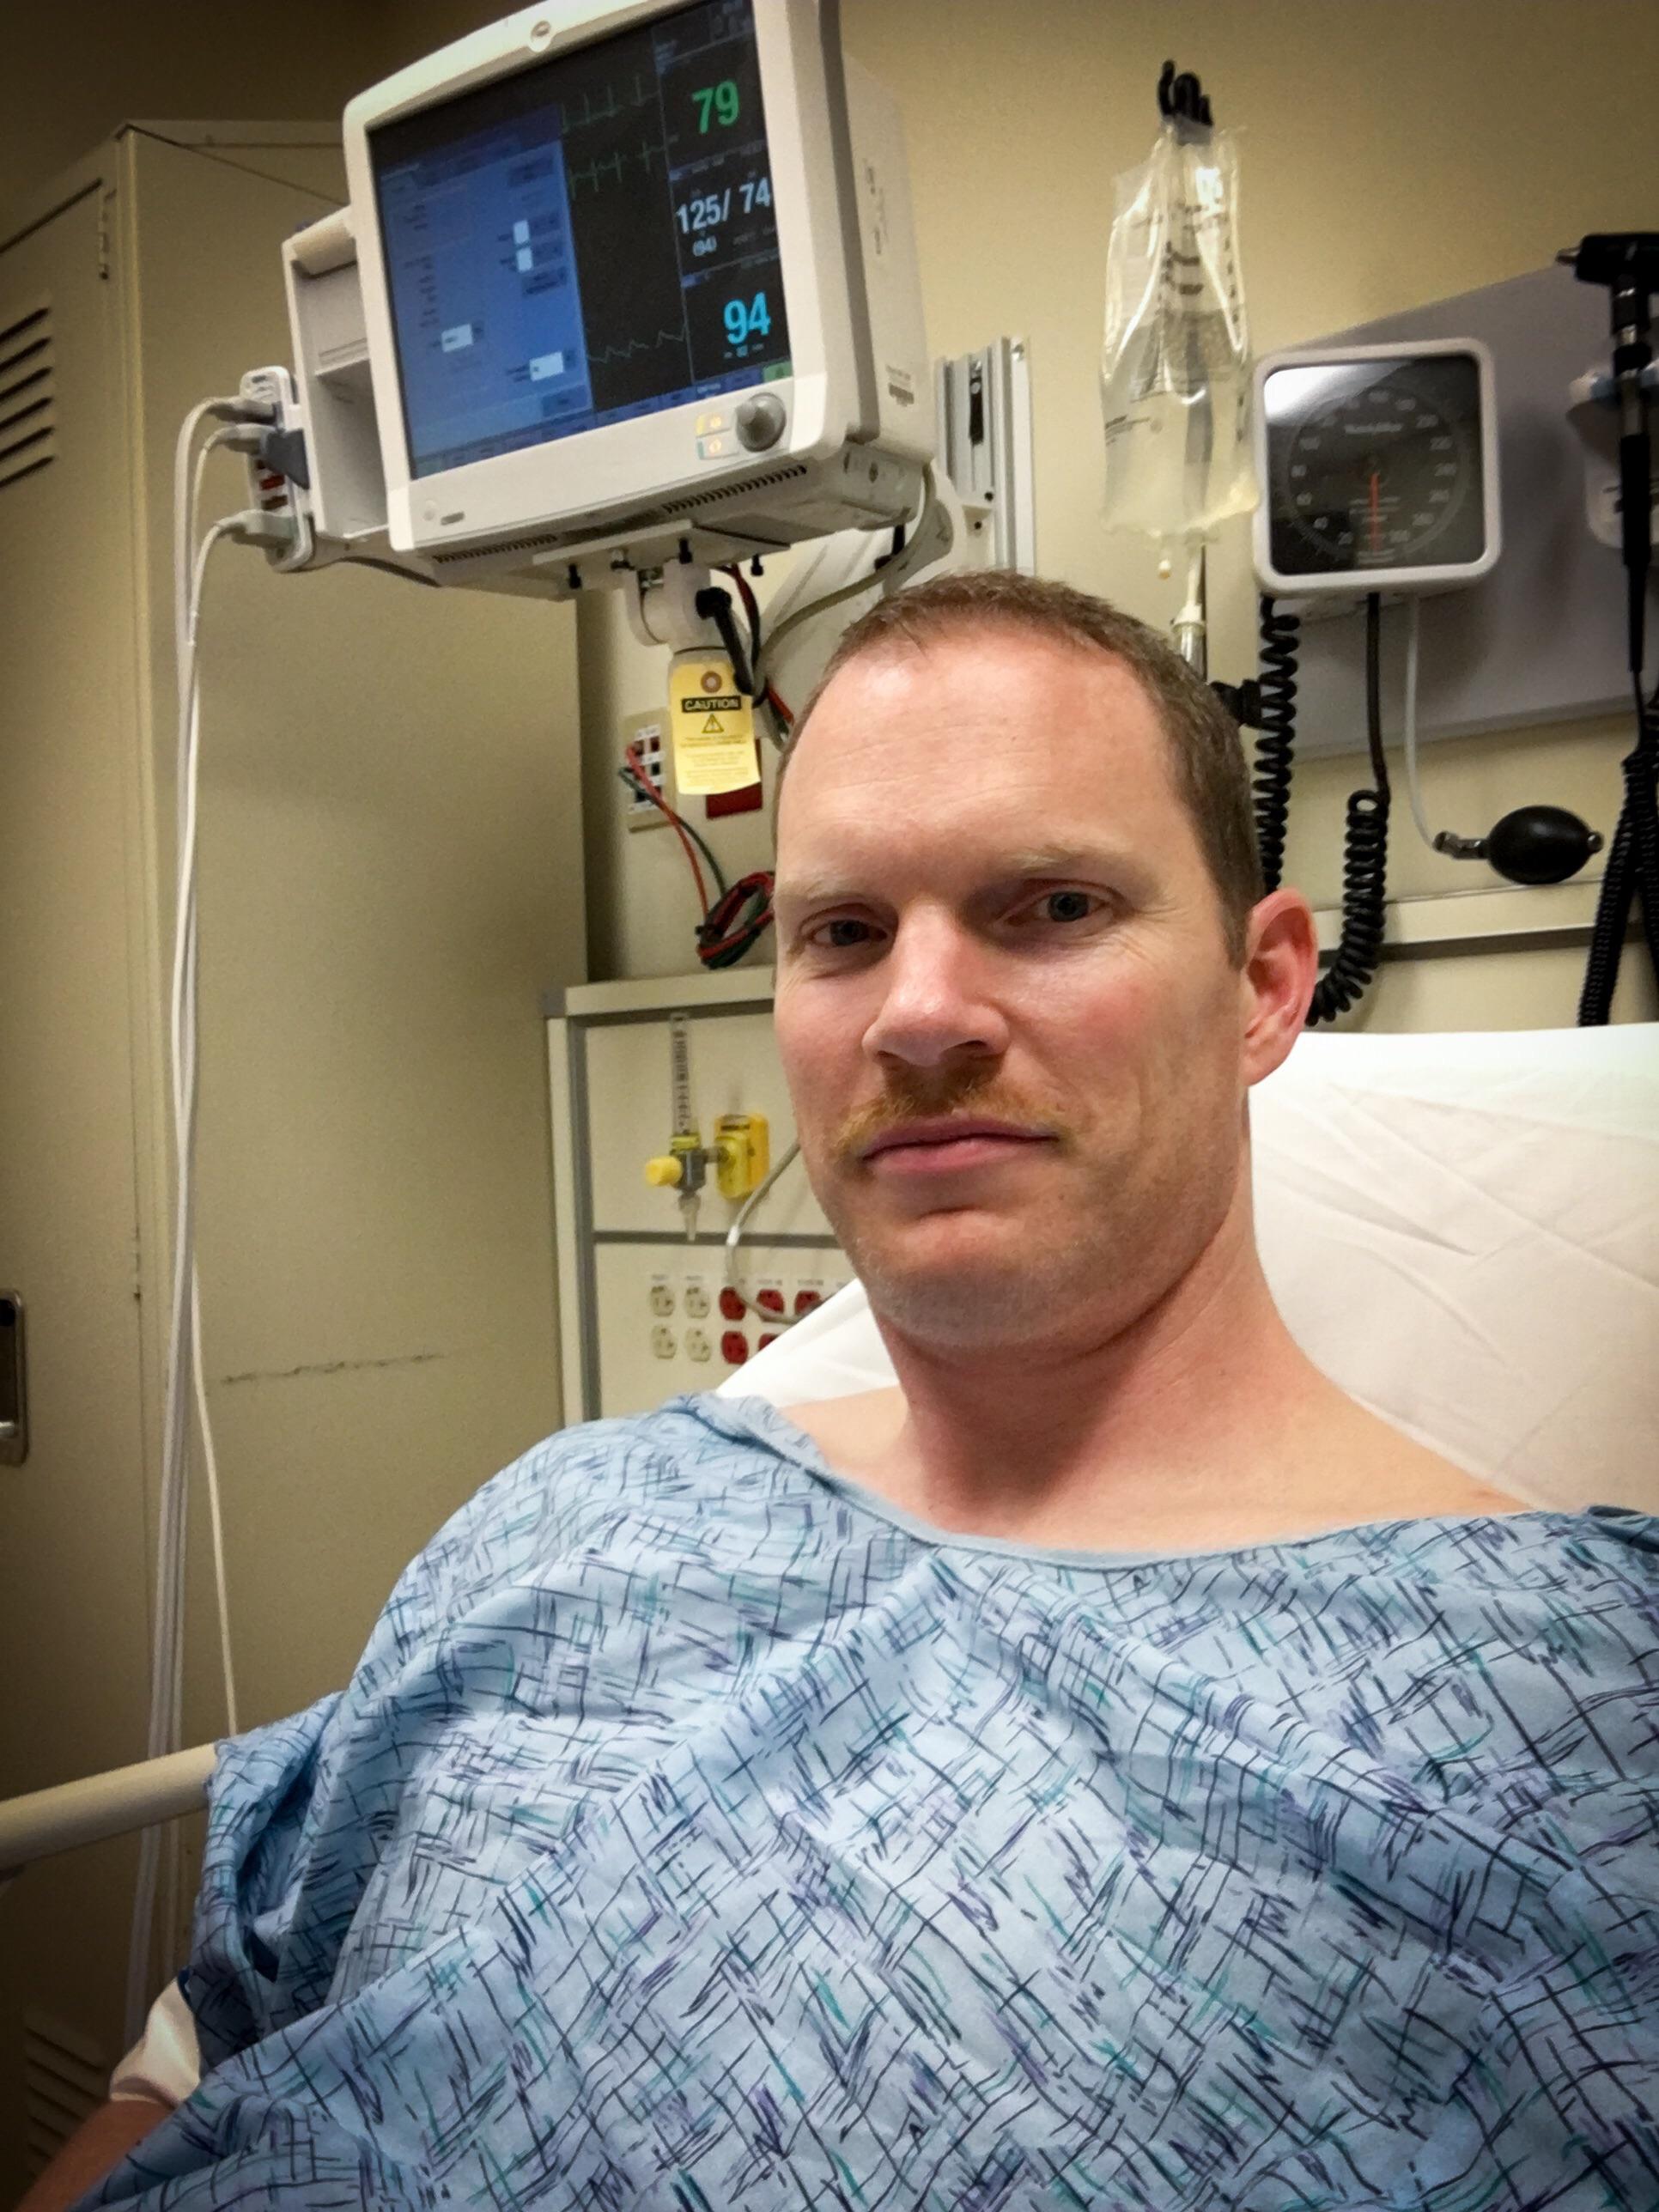 Tim in the emergency room.